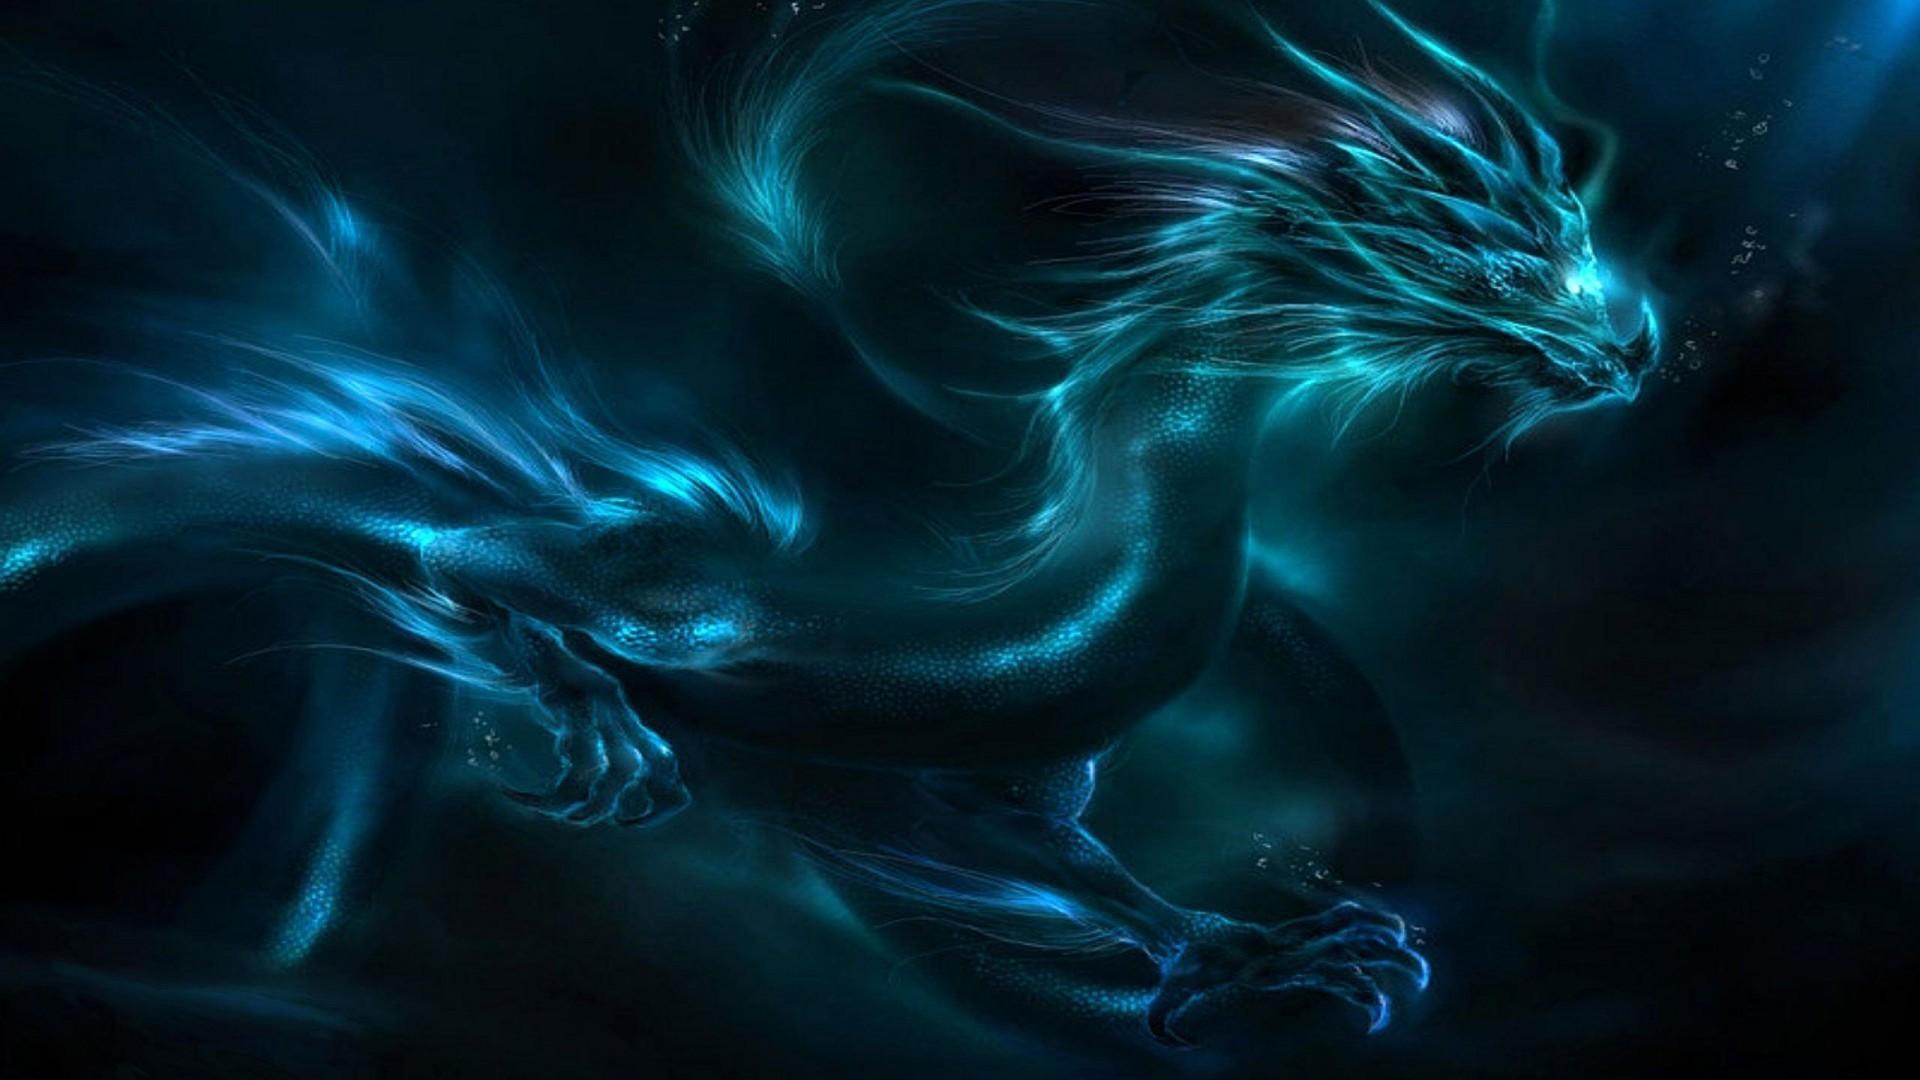 Res: 1920x1080, HD Cool Dragons Pics - Download Free - 228502286